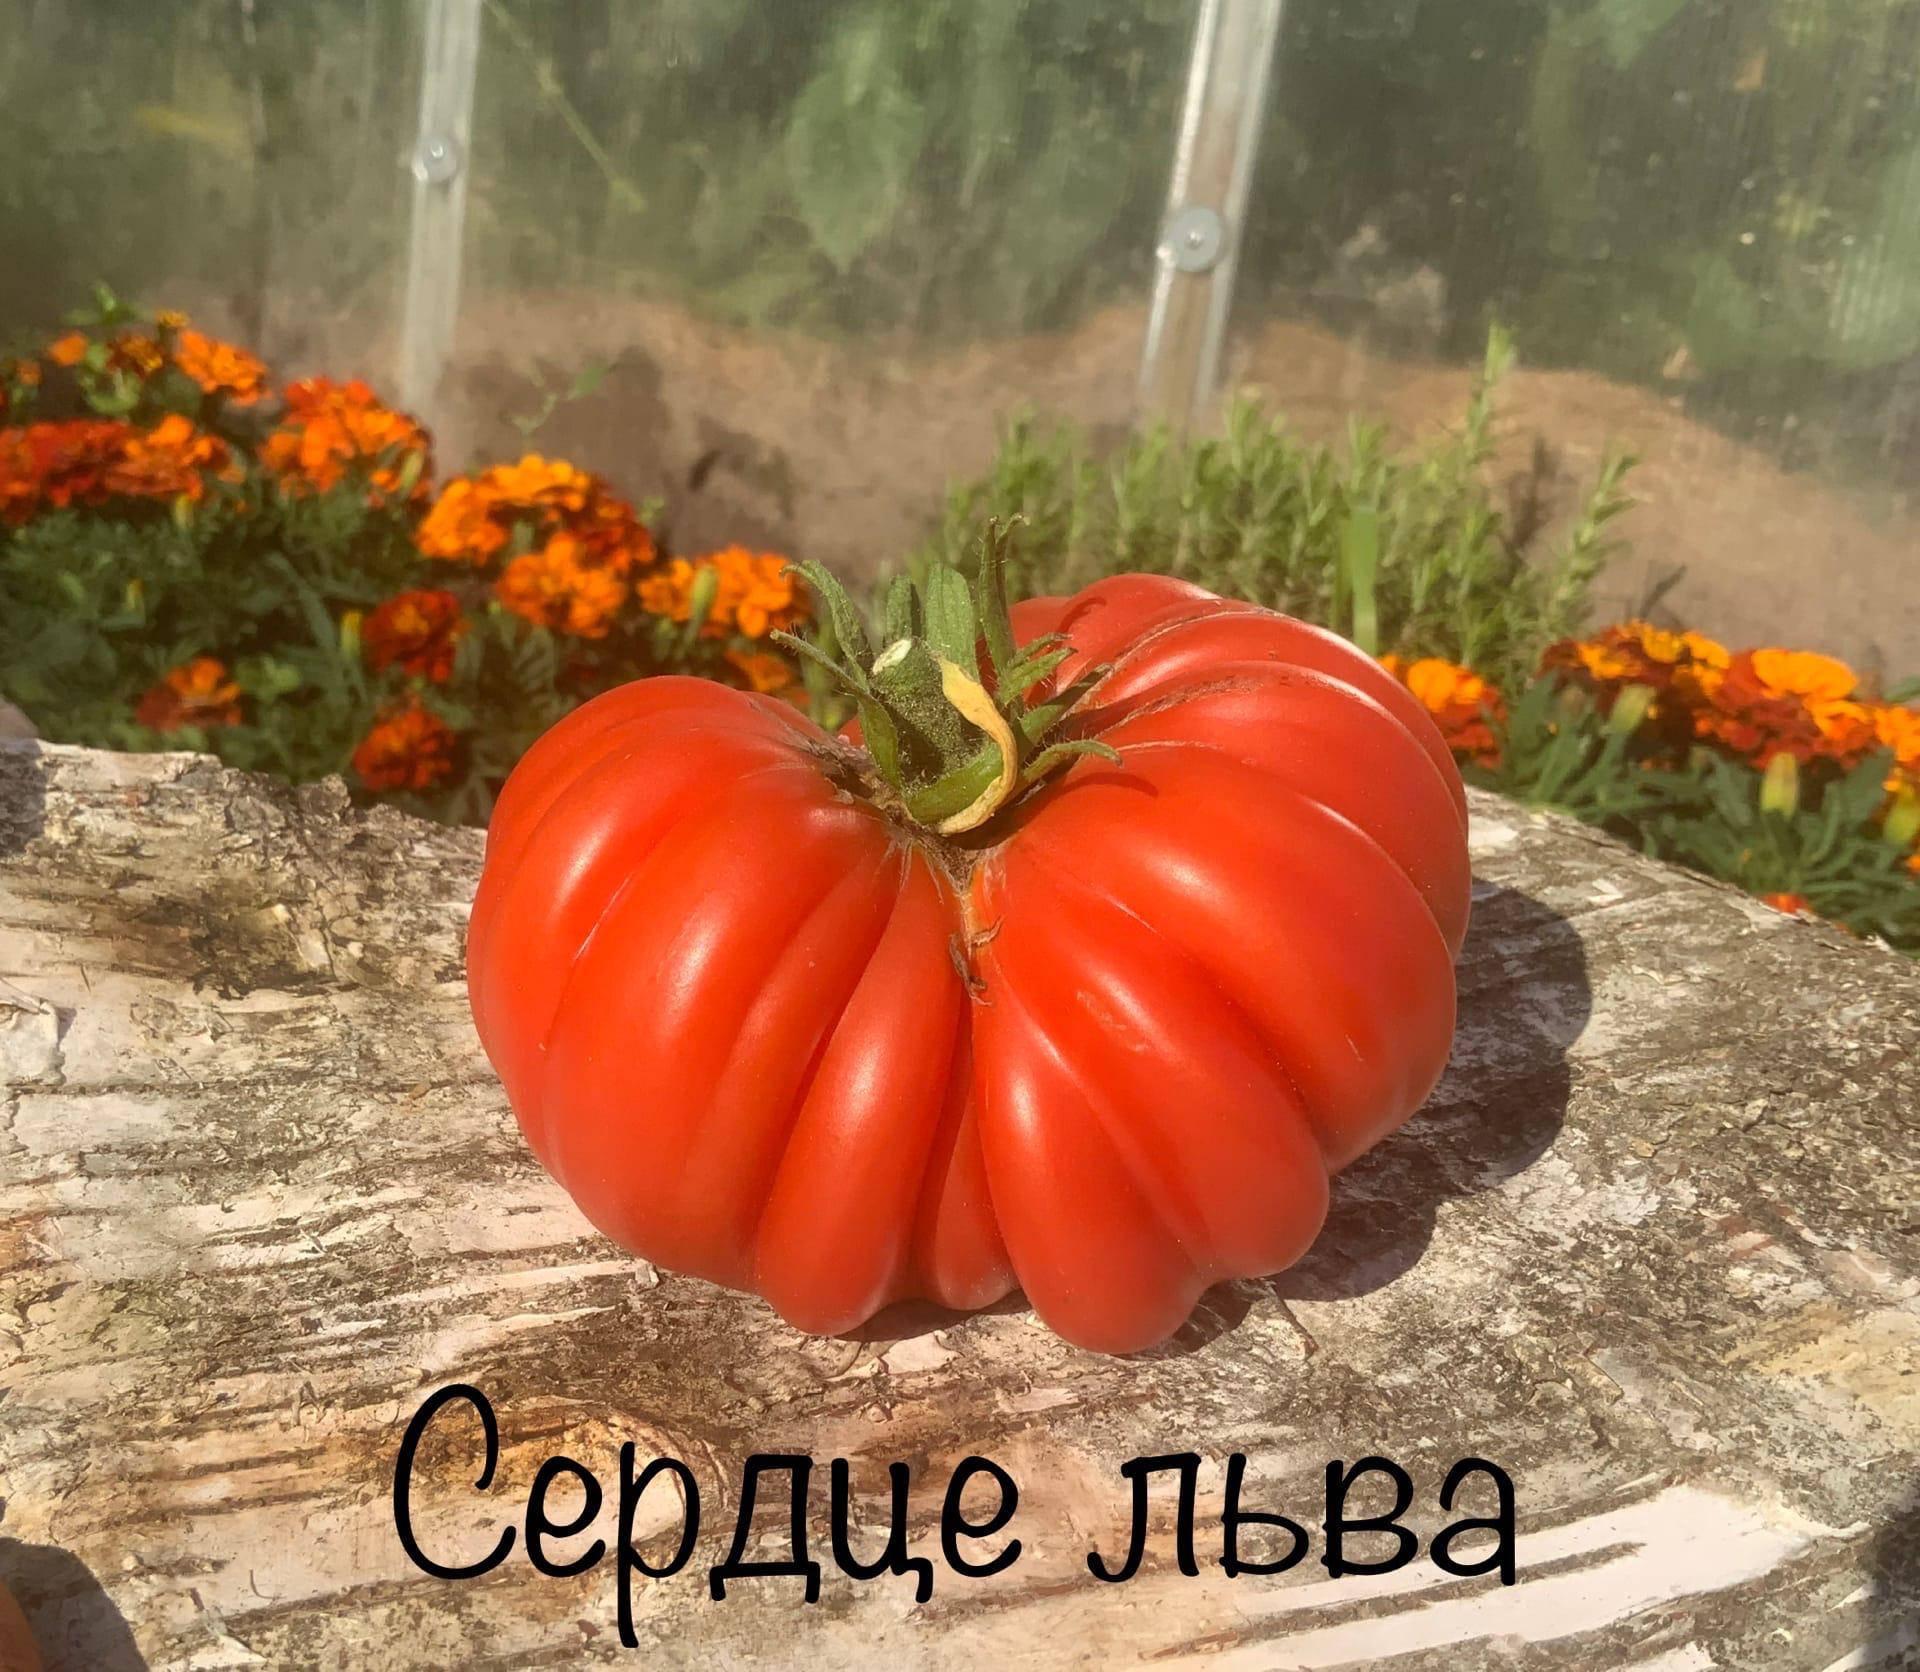 gCOp_XiEBUw.jpg